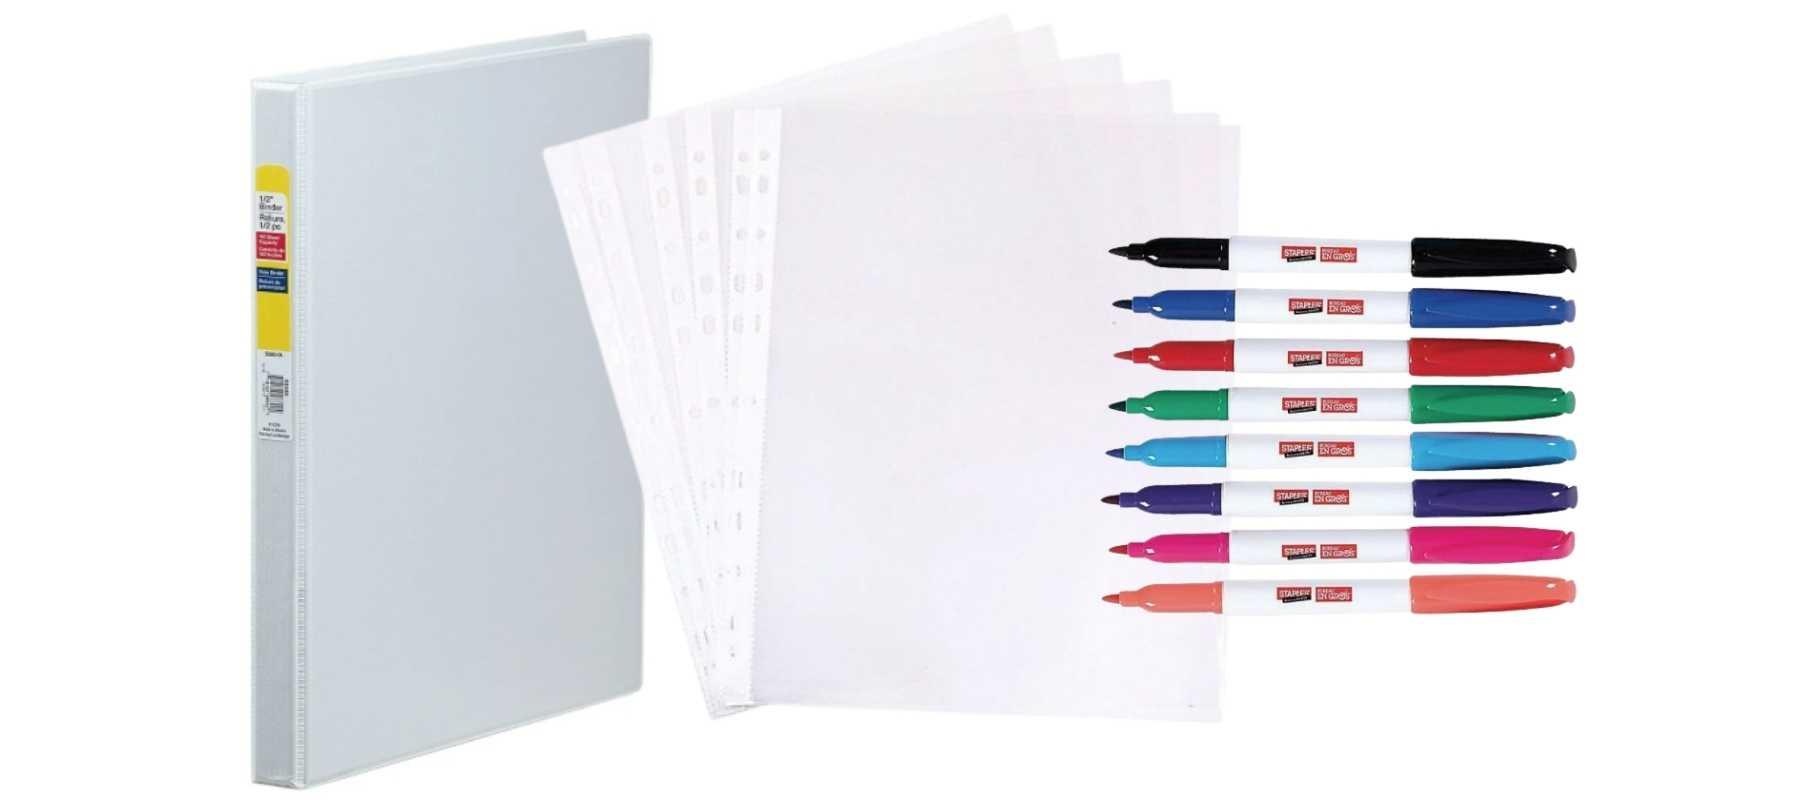 DIY Wedding Planning Guide and checklist - binder